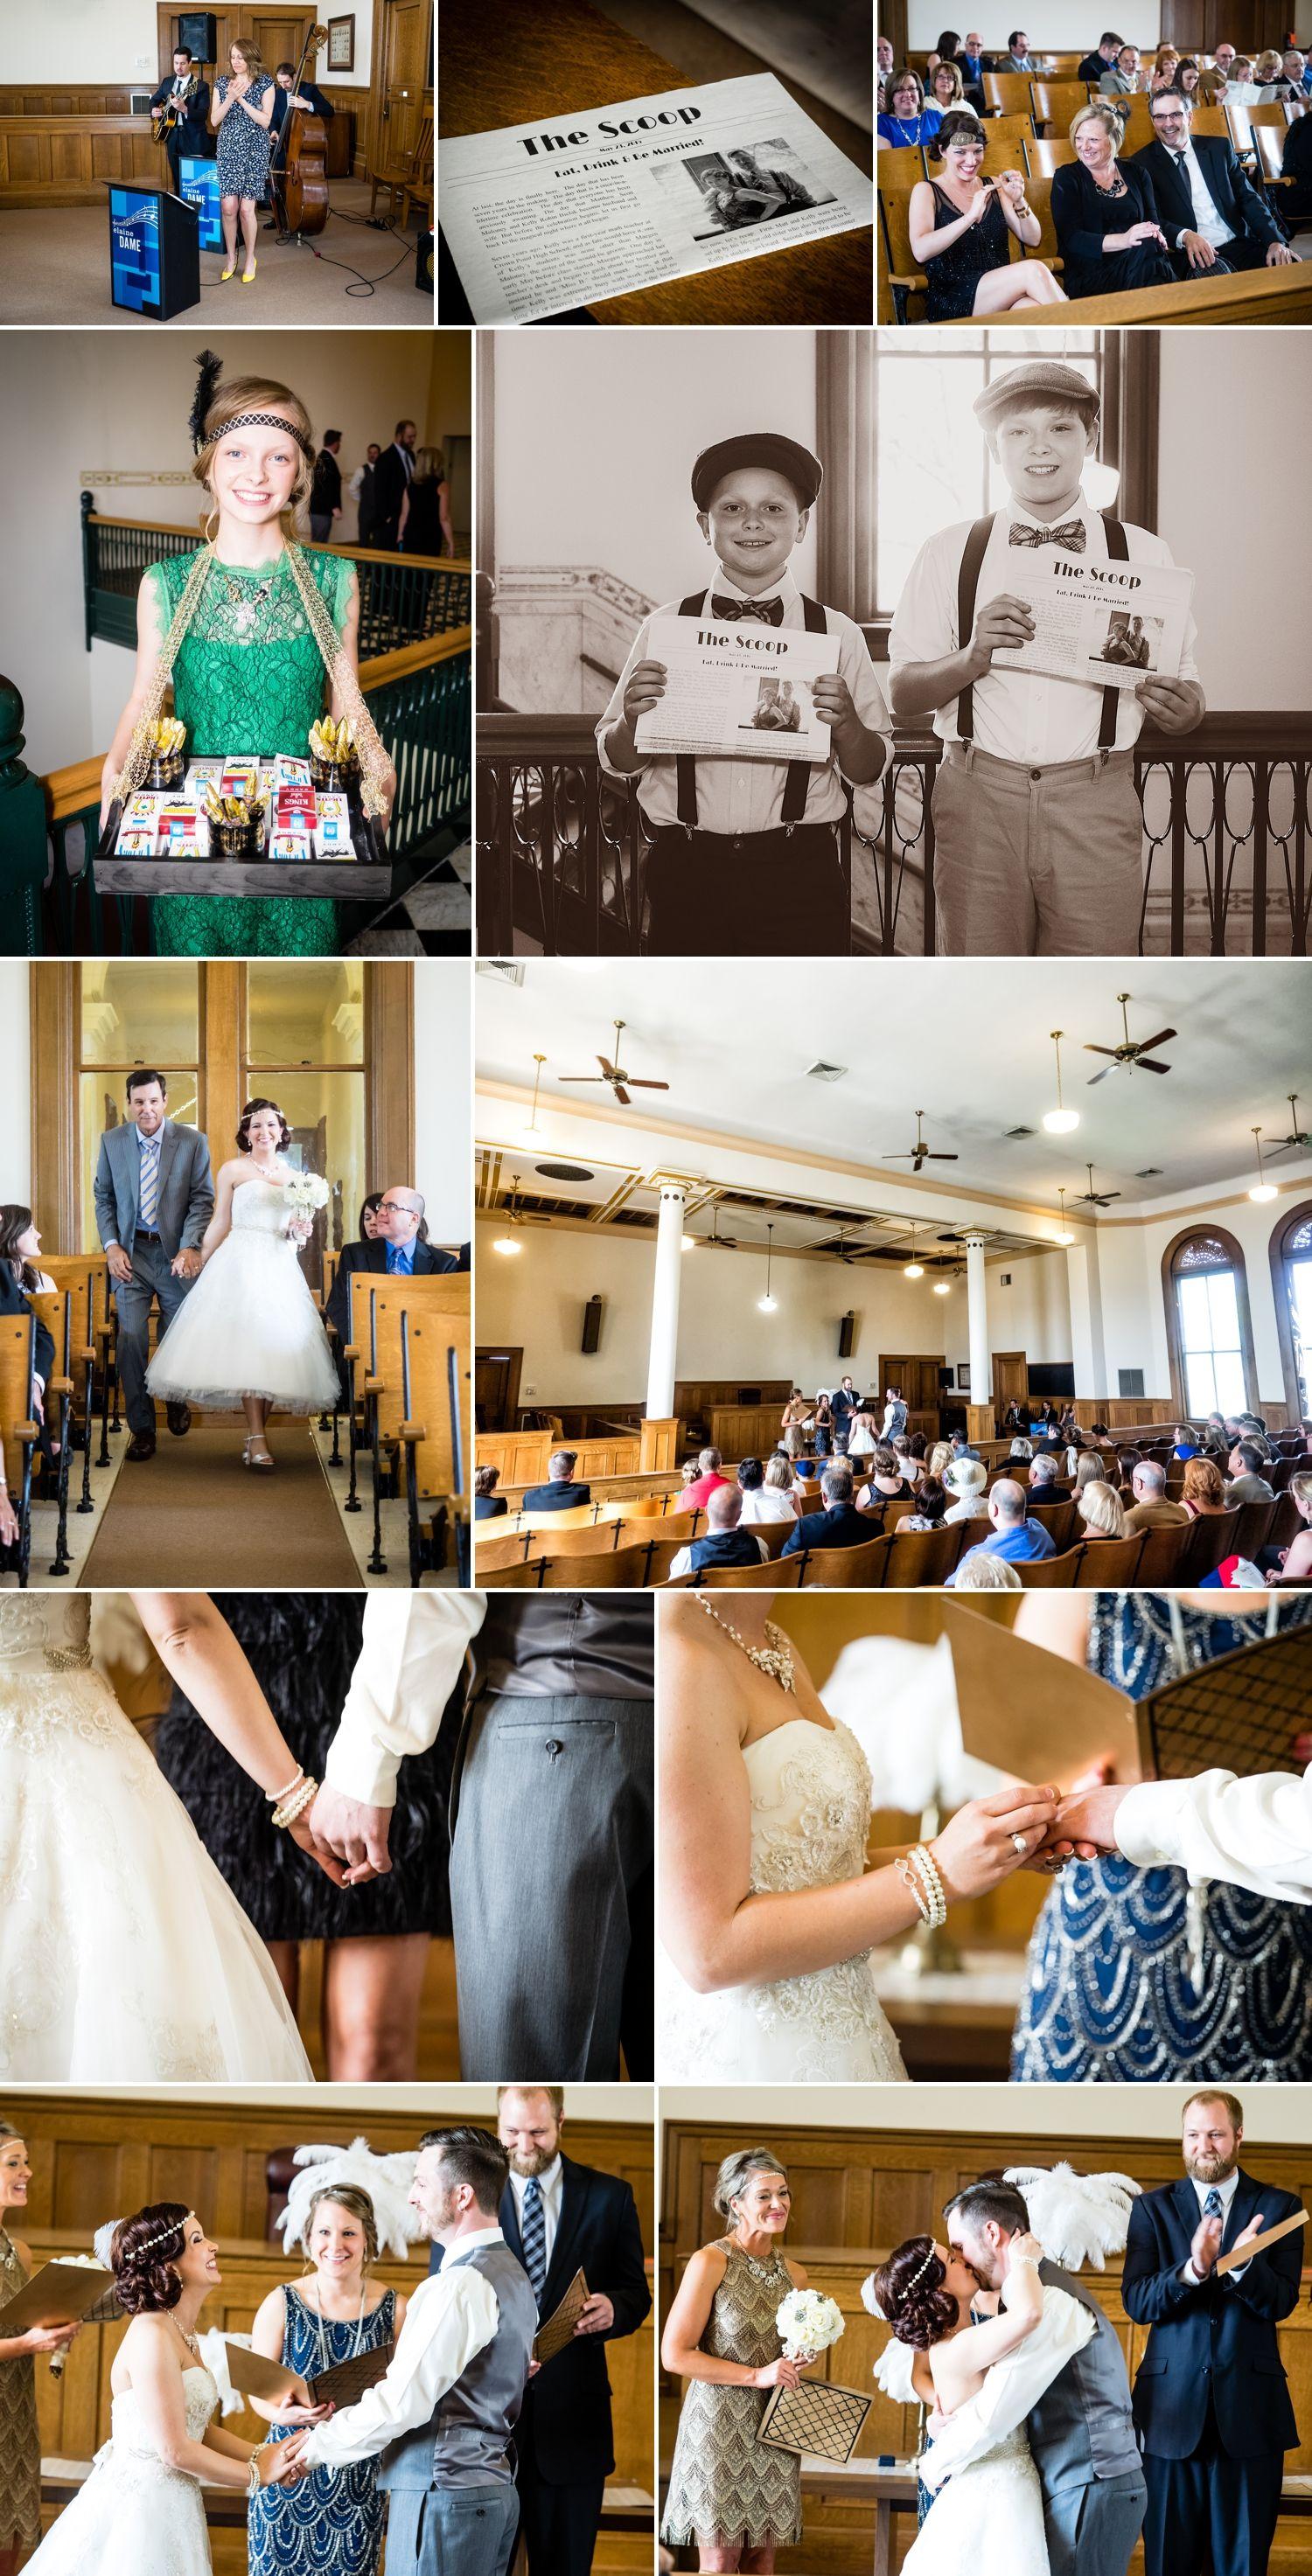 Crown Point Courthouse Wedding Photos